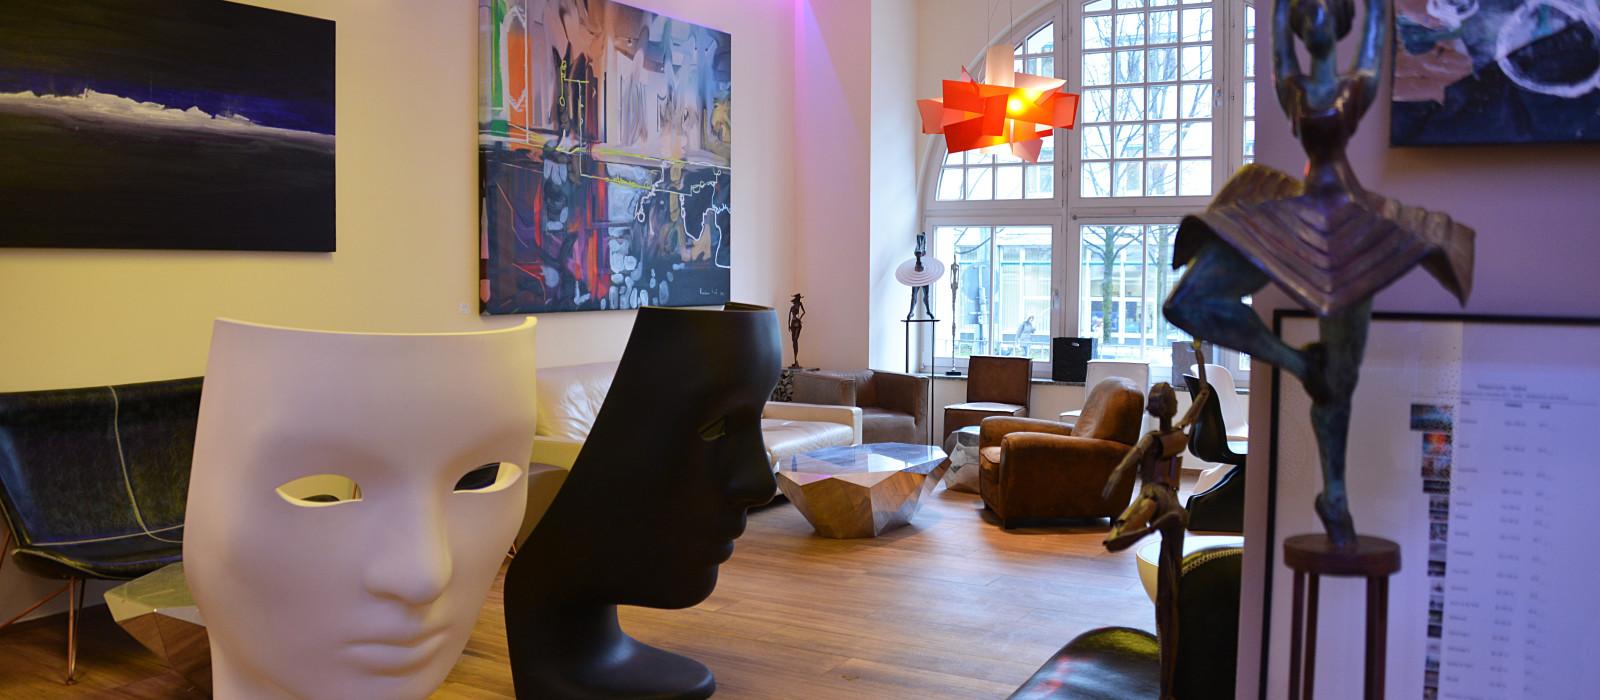 Hotel Art Munich Germany